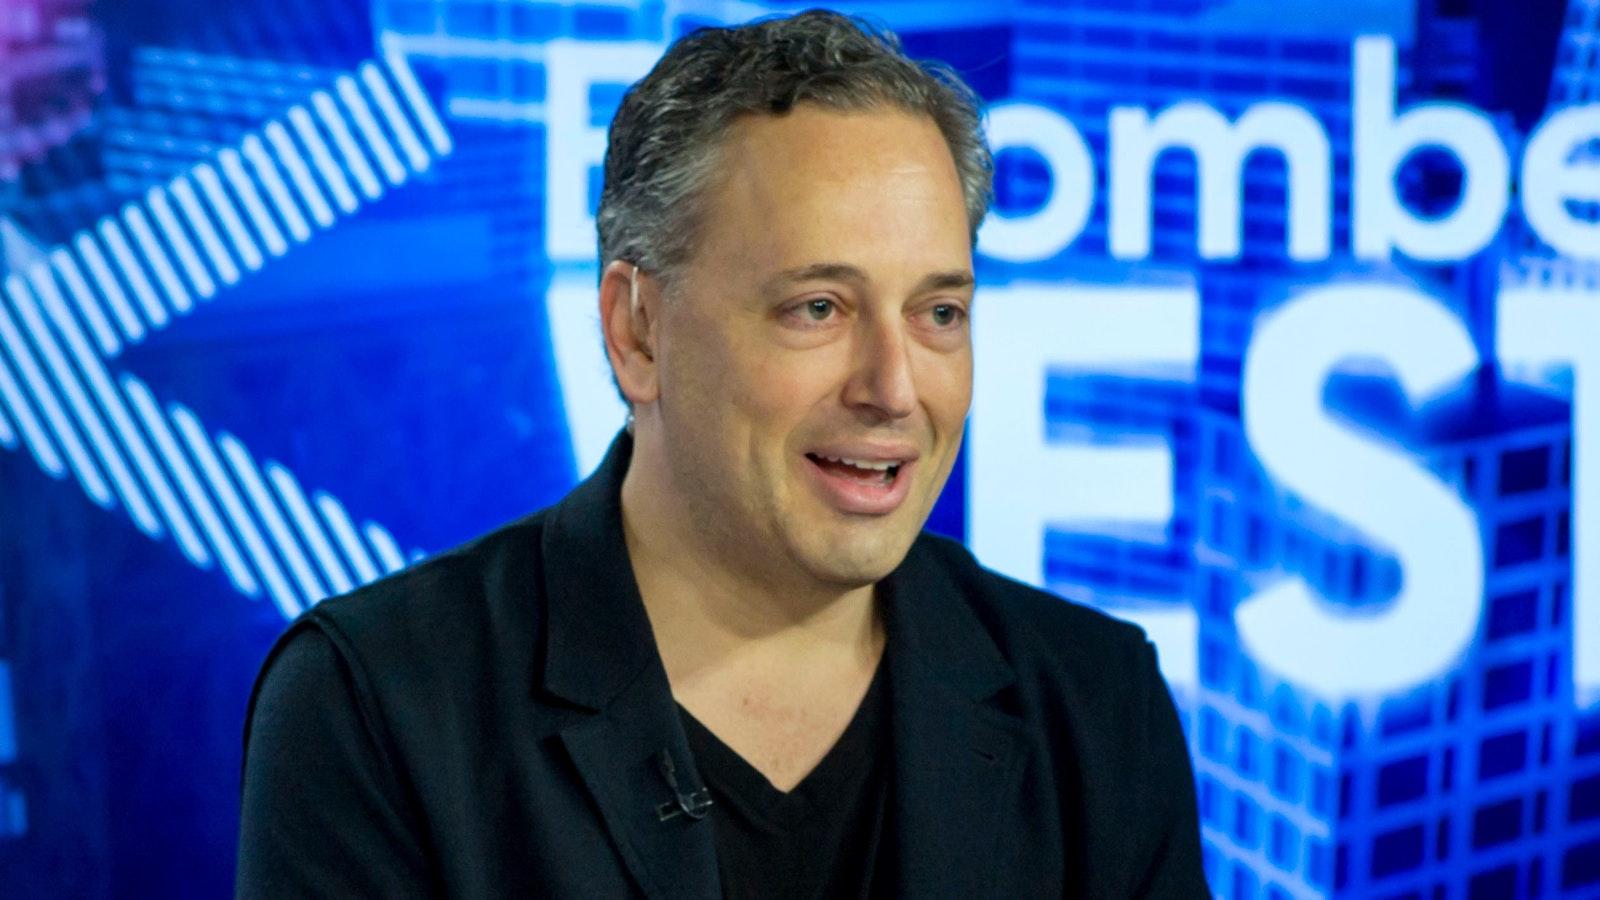 Zenefits CEO David Sacks. Photo by Bloomberg.